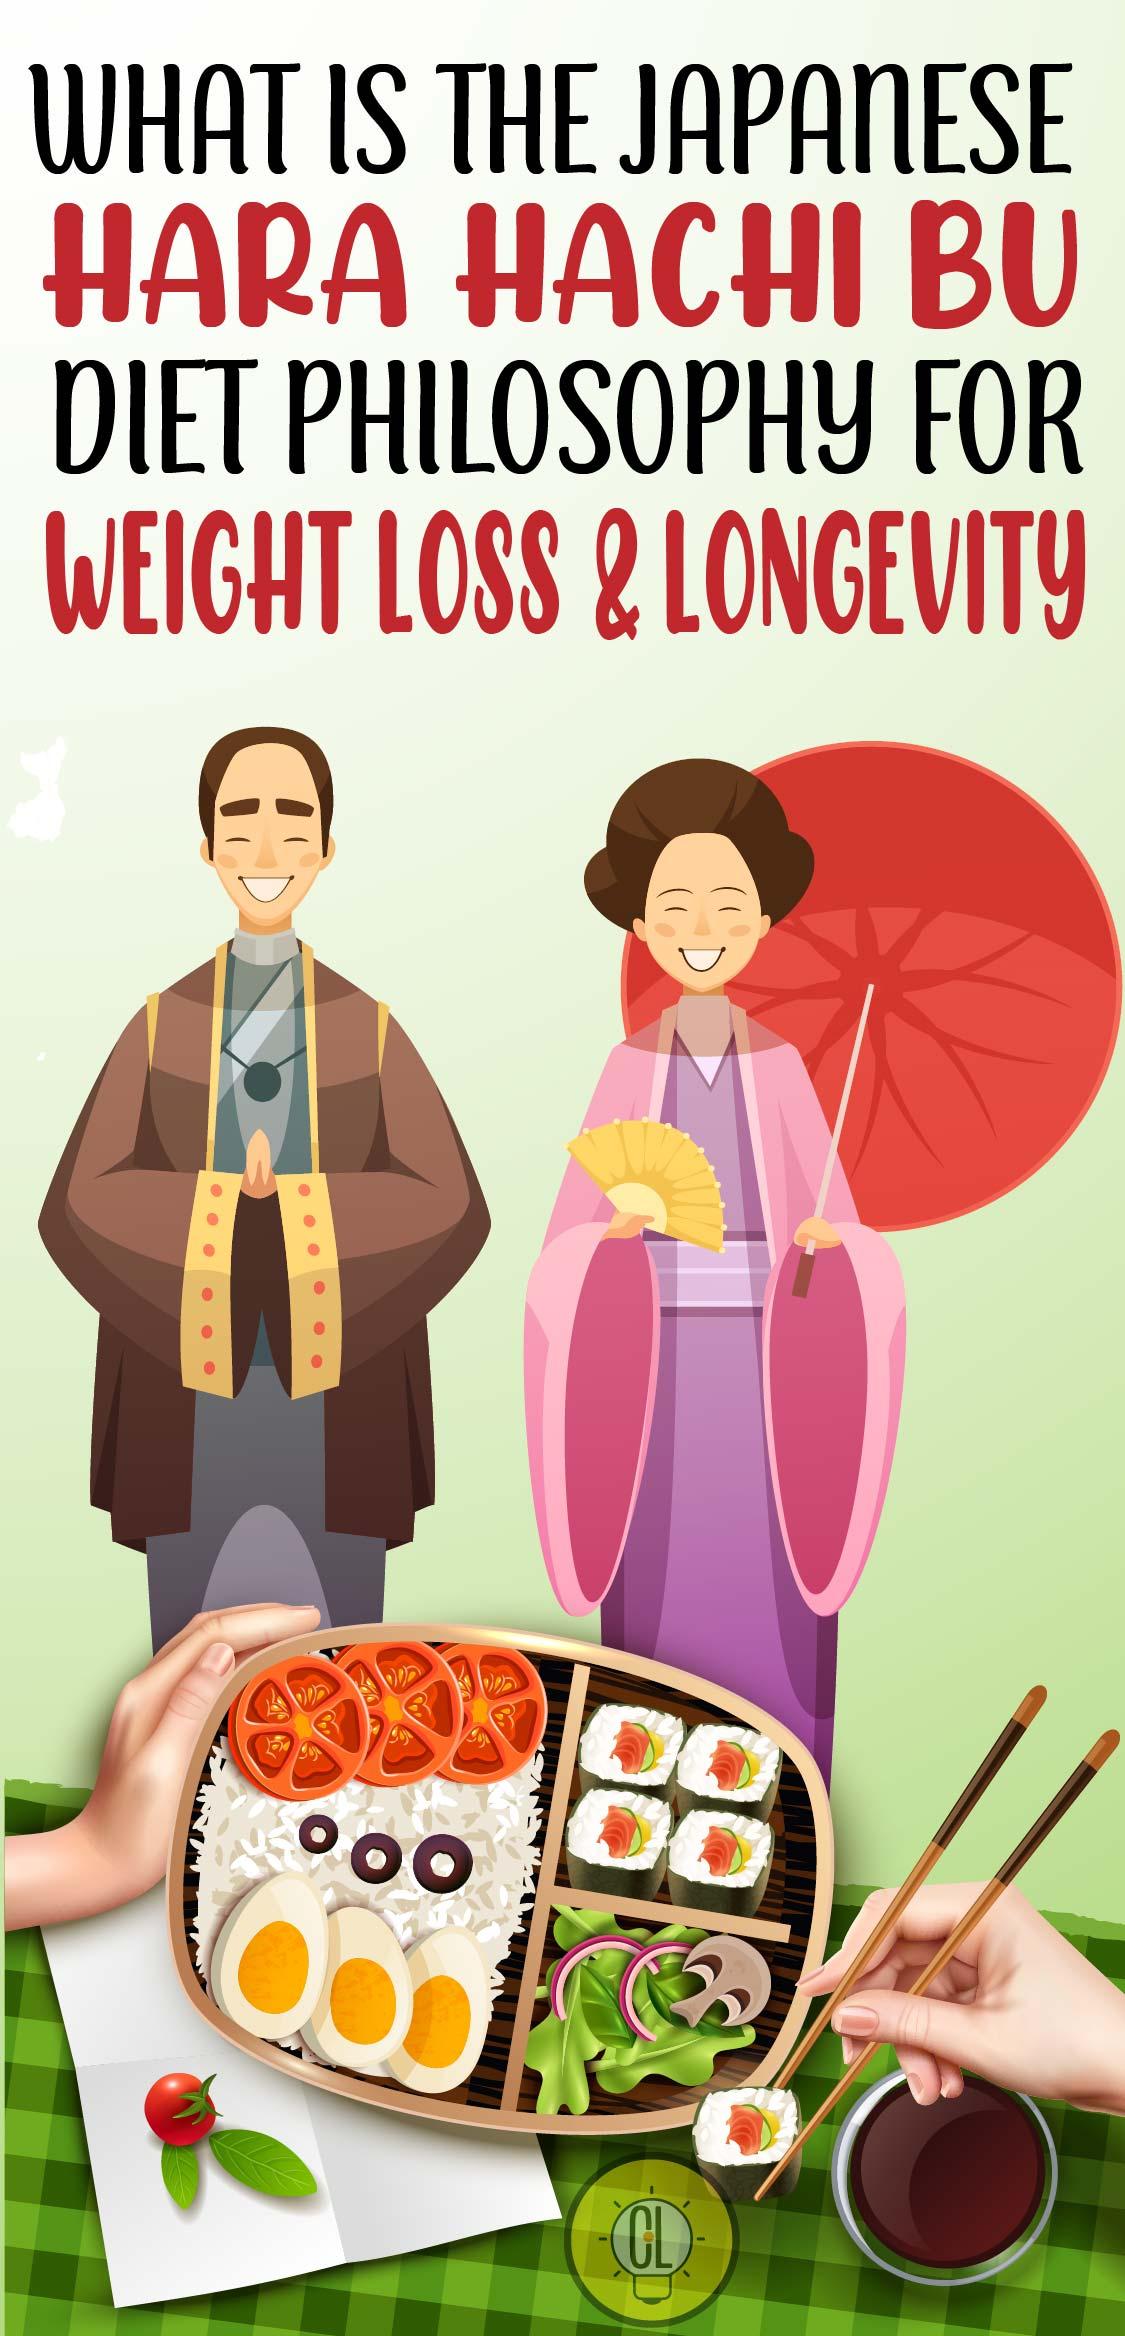 japanese hara hachi bu diet philosophy-01